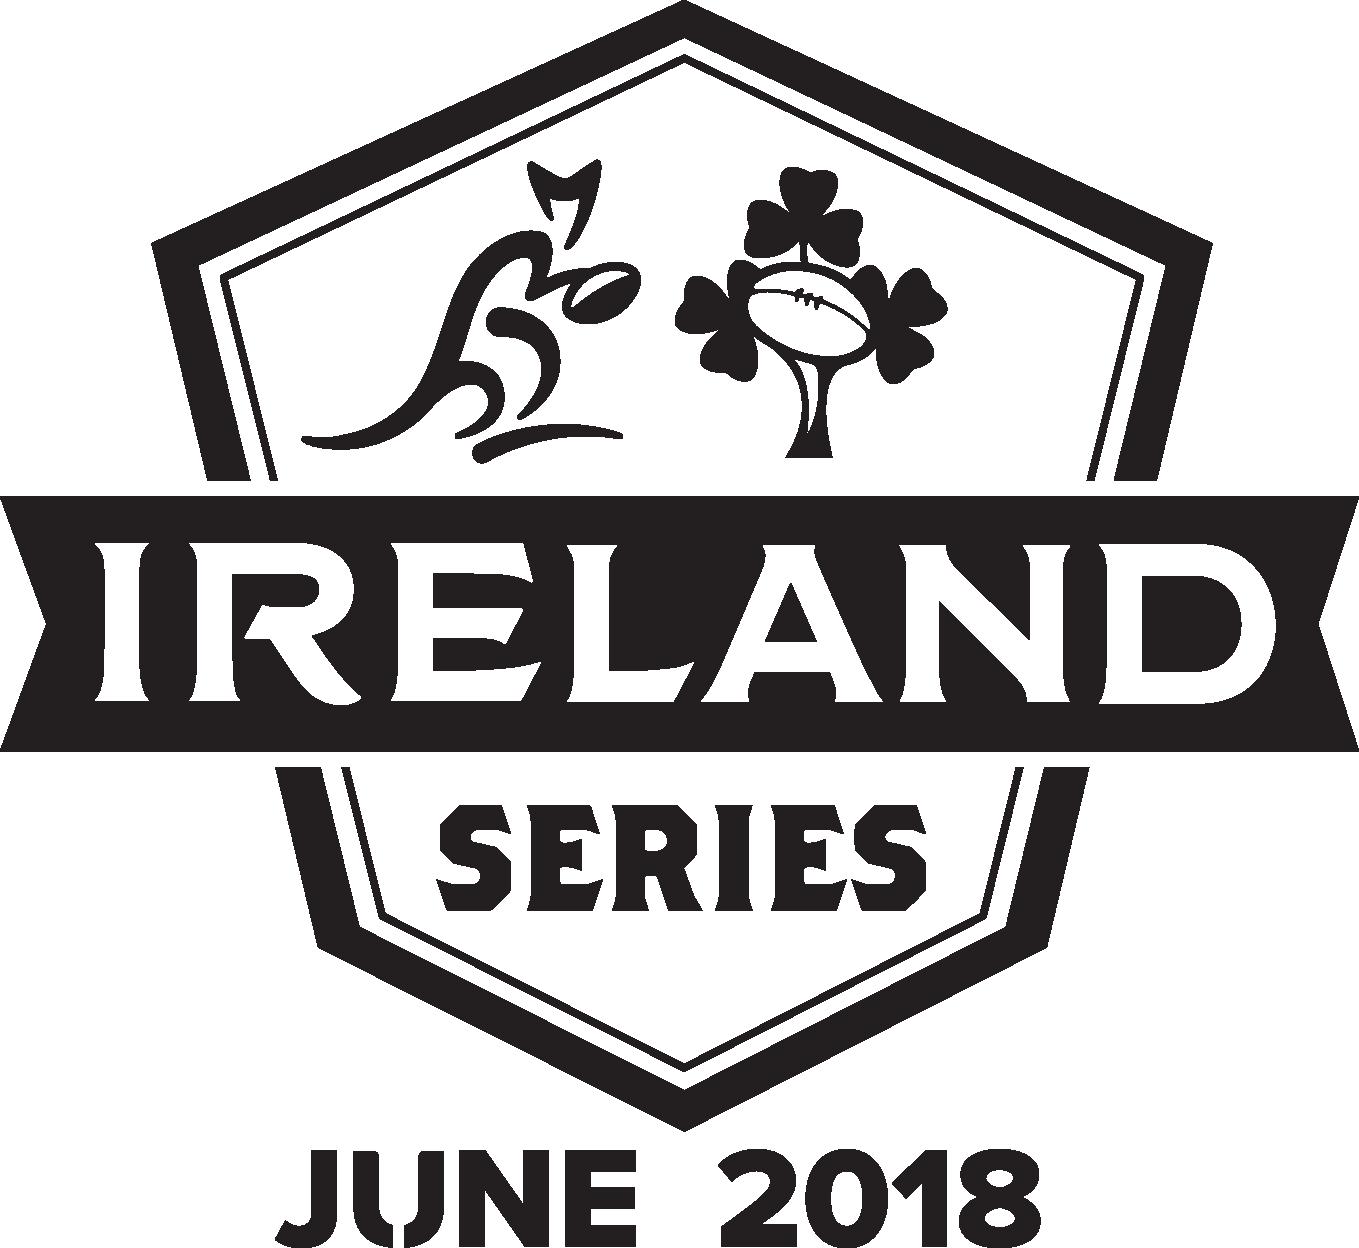 2018_Ireland_Series_Mono_Black.png